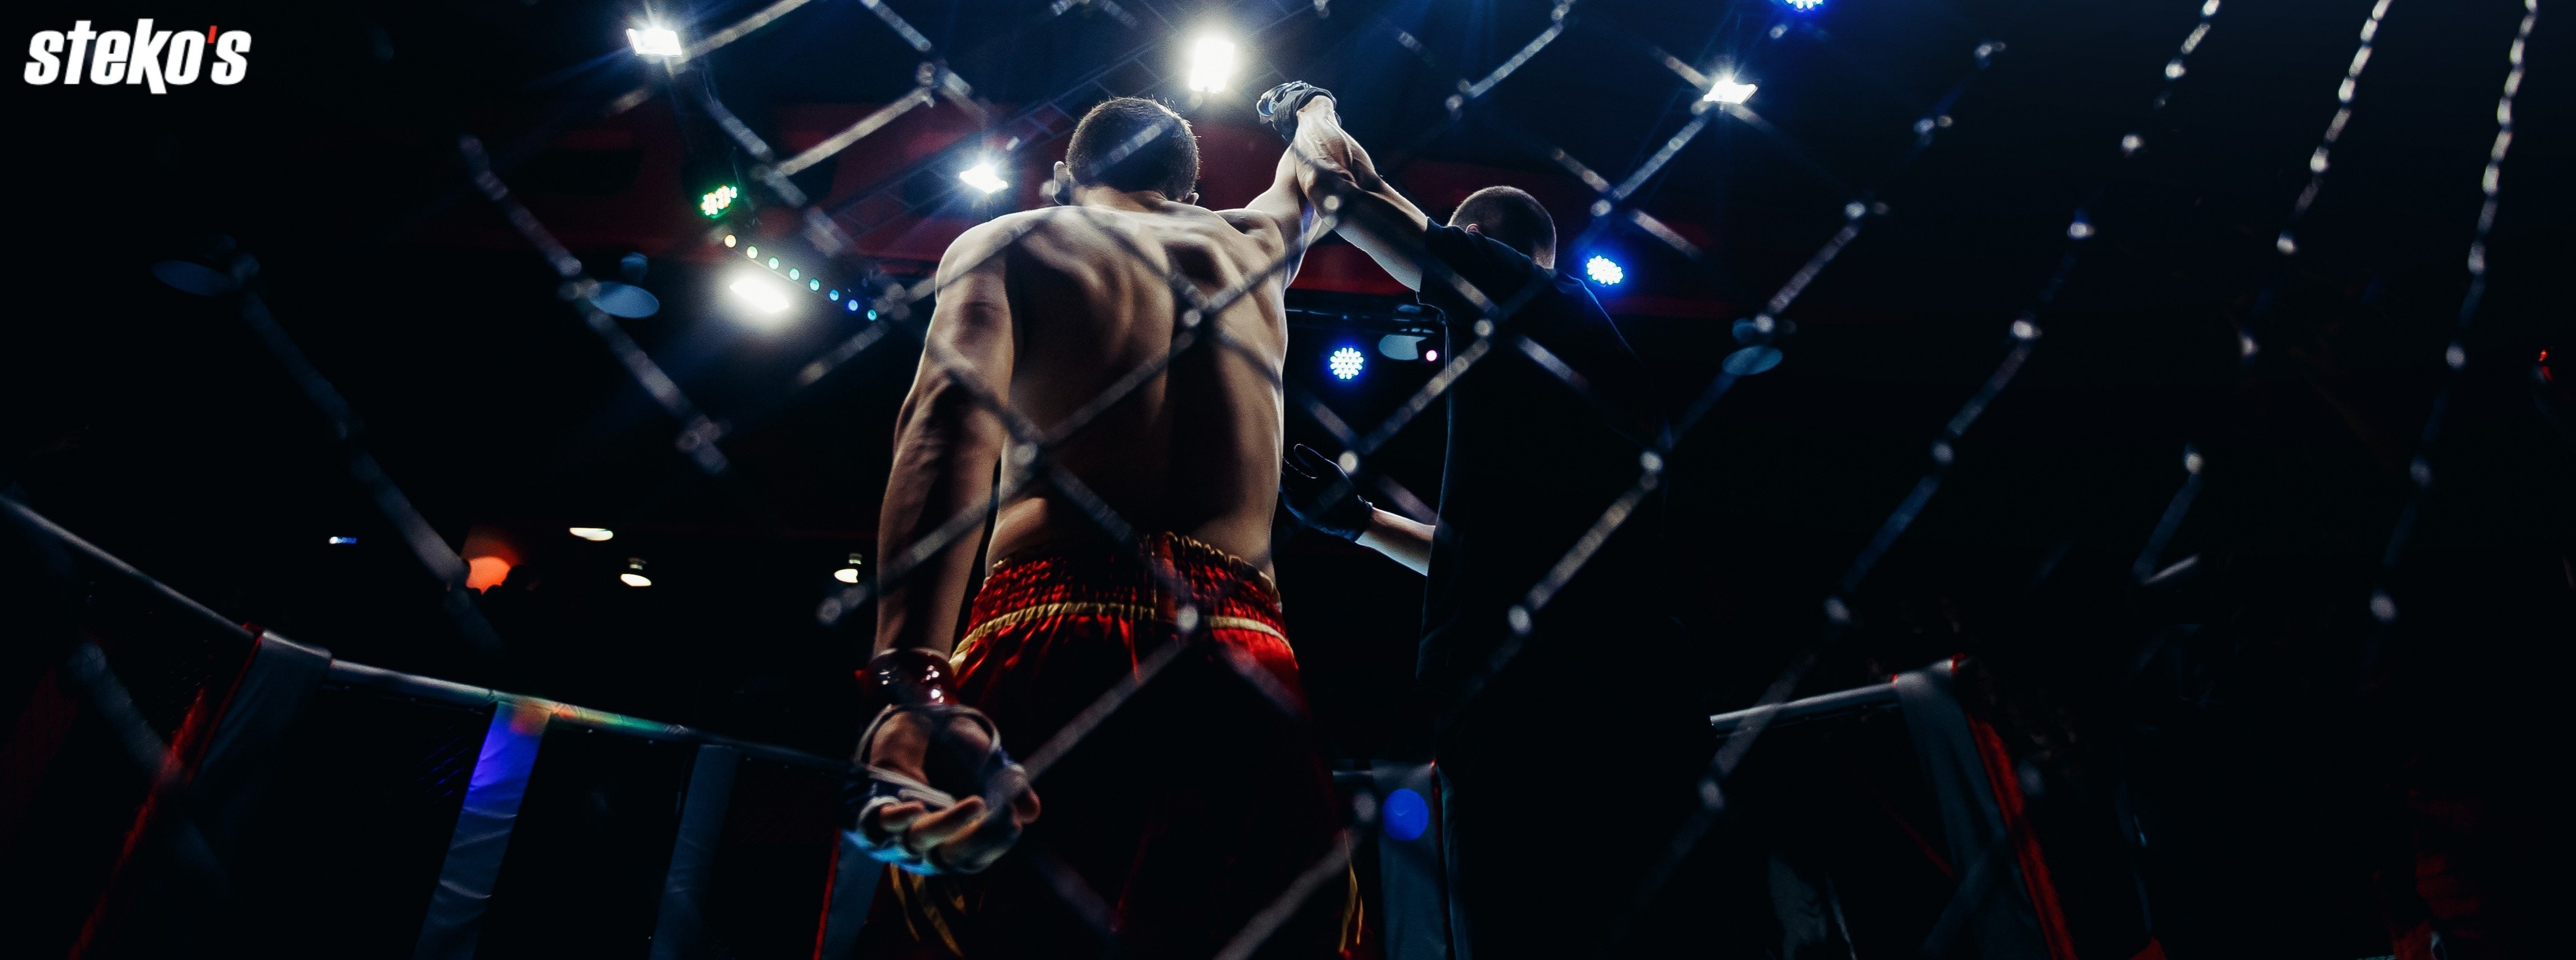 Steko's Fight Night: WM-Kämpfe mit M.Lang, S.Preuss, D.Morin...